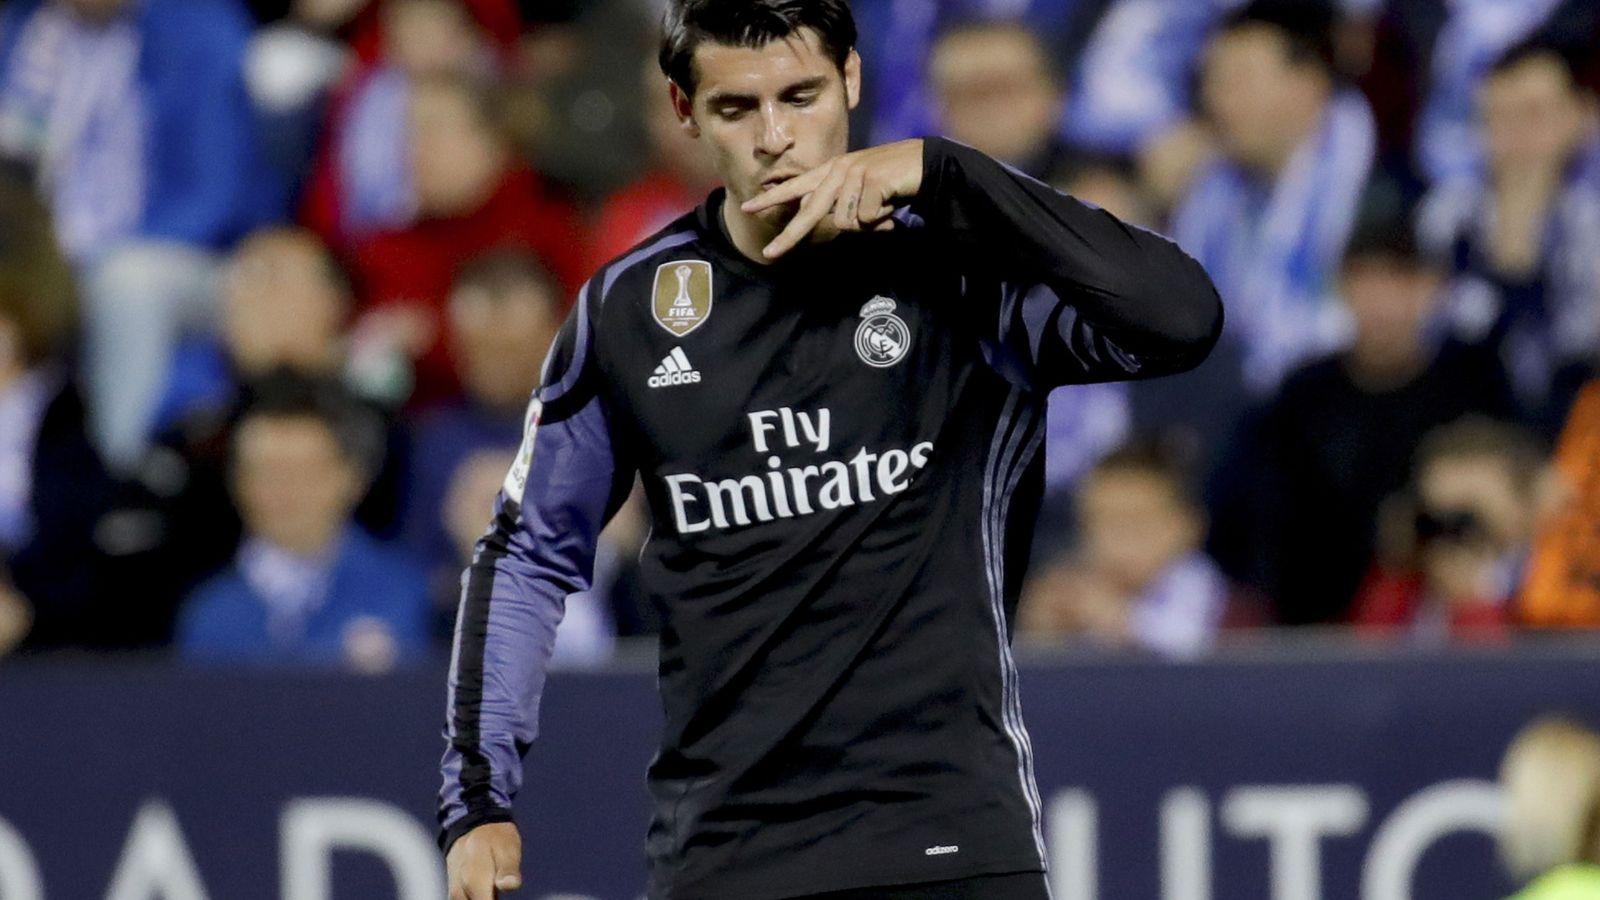 Foto: Álvaro Morata celebra un gol durante su segunda etapa en el Real Madrid. (EFE)